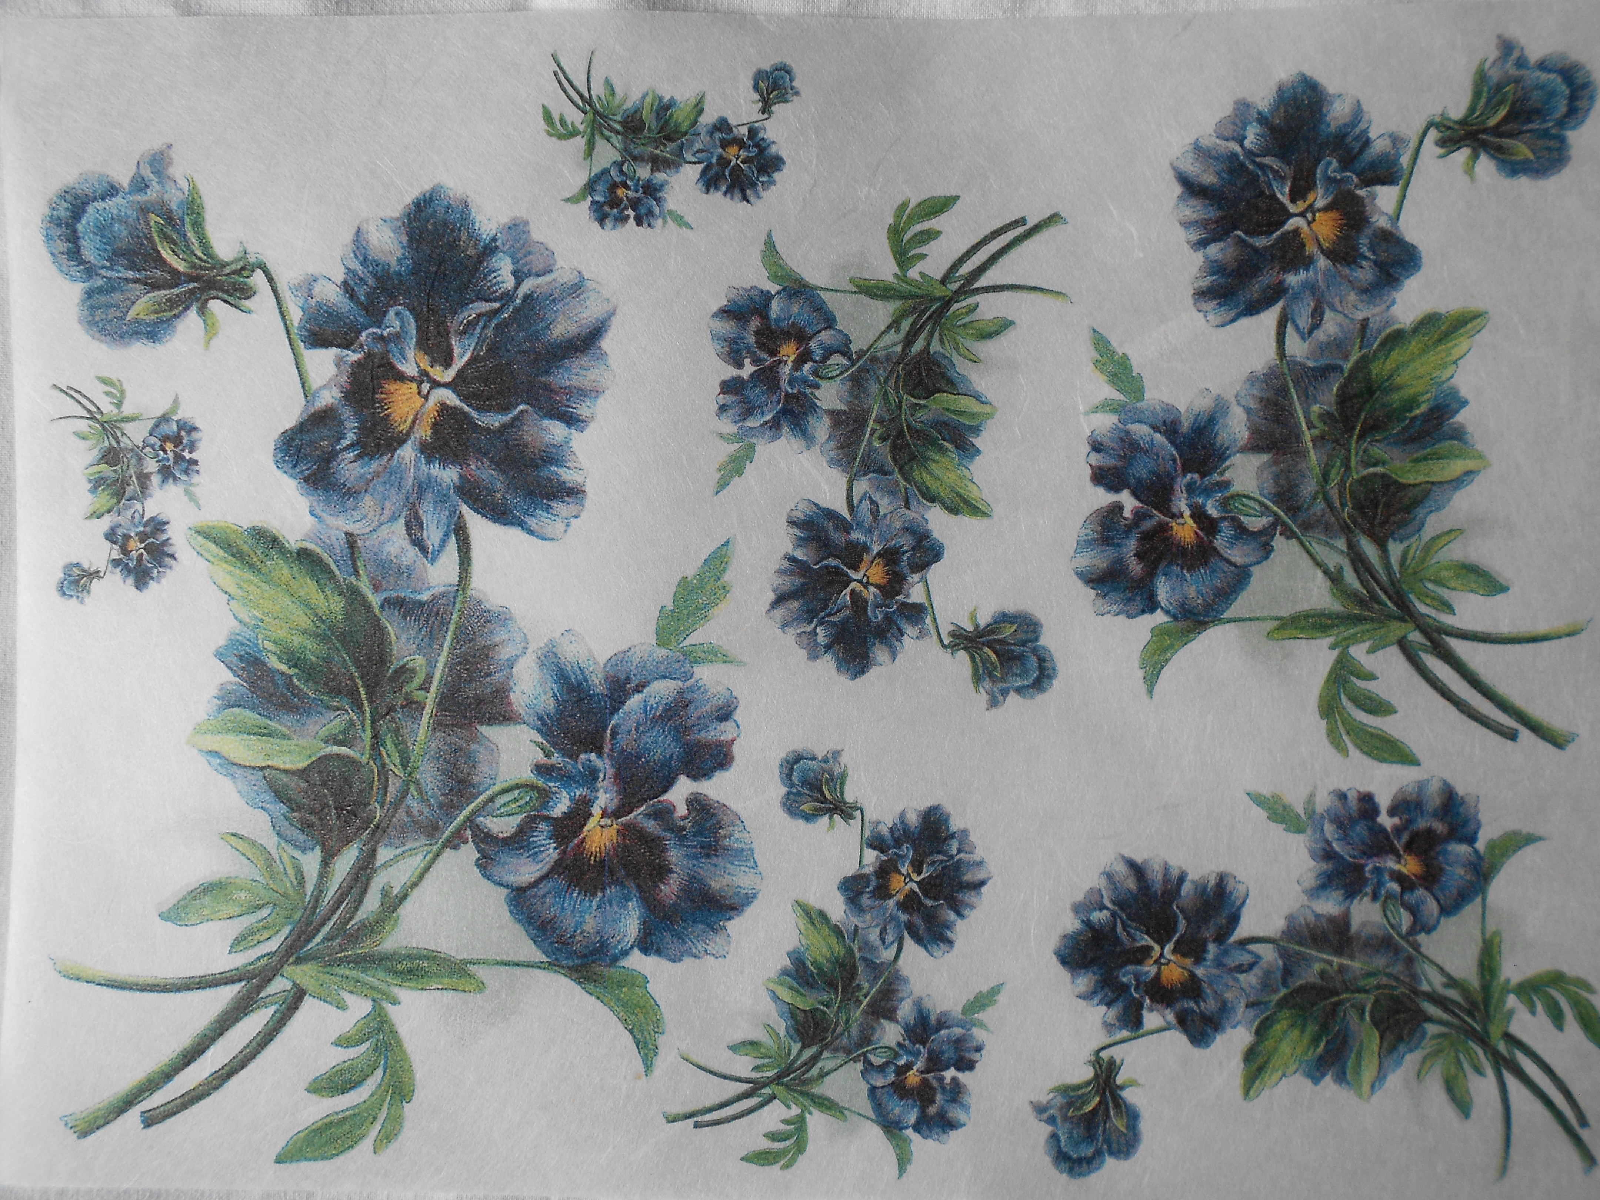 Dark Blue Pansies Violets Decoupage Rice Paper Decoupage